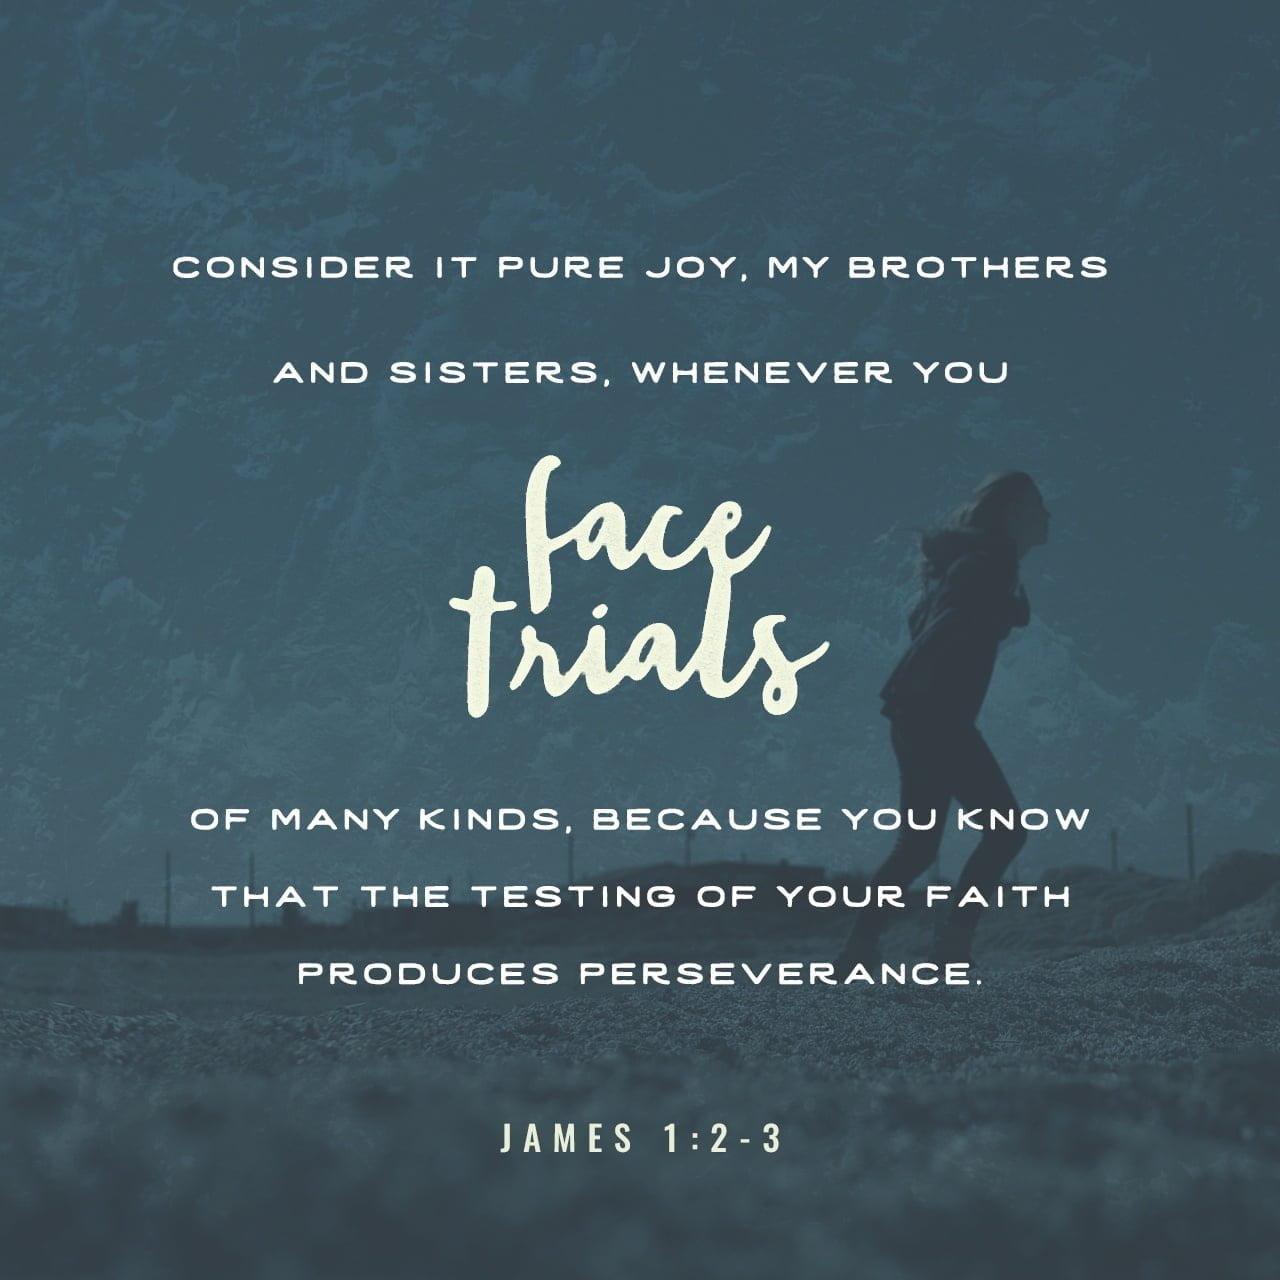 James 1:2-3 NLT